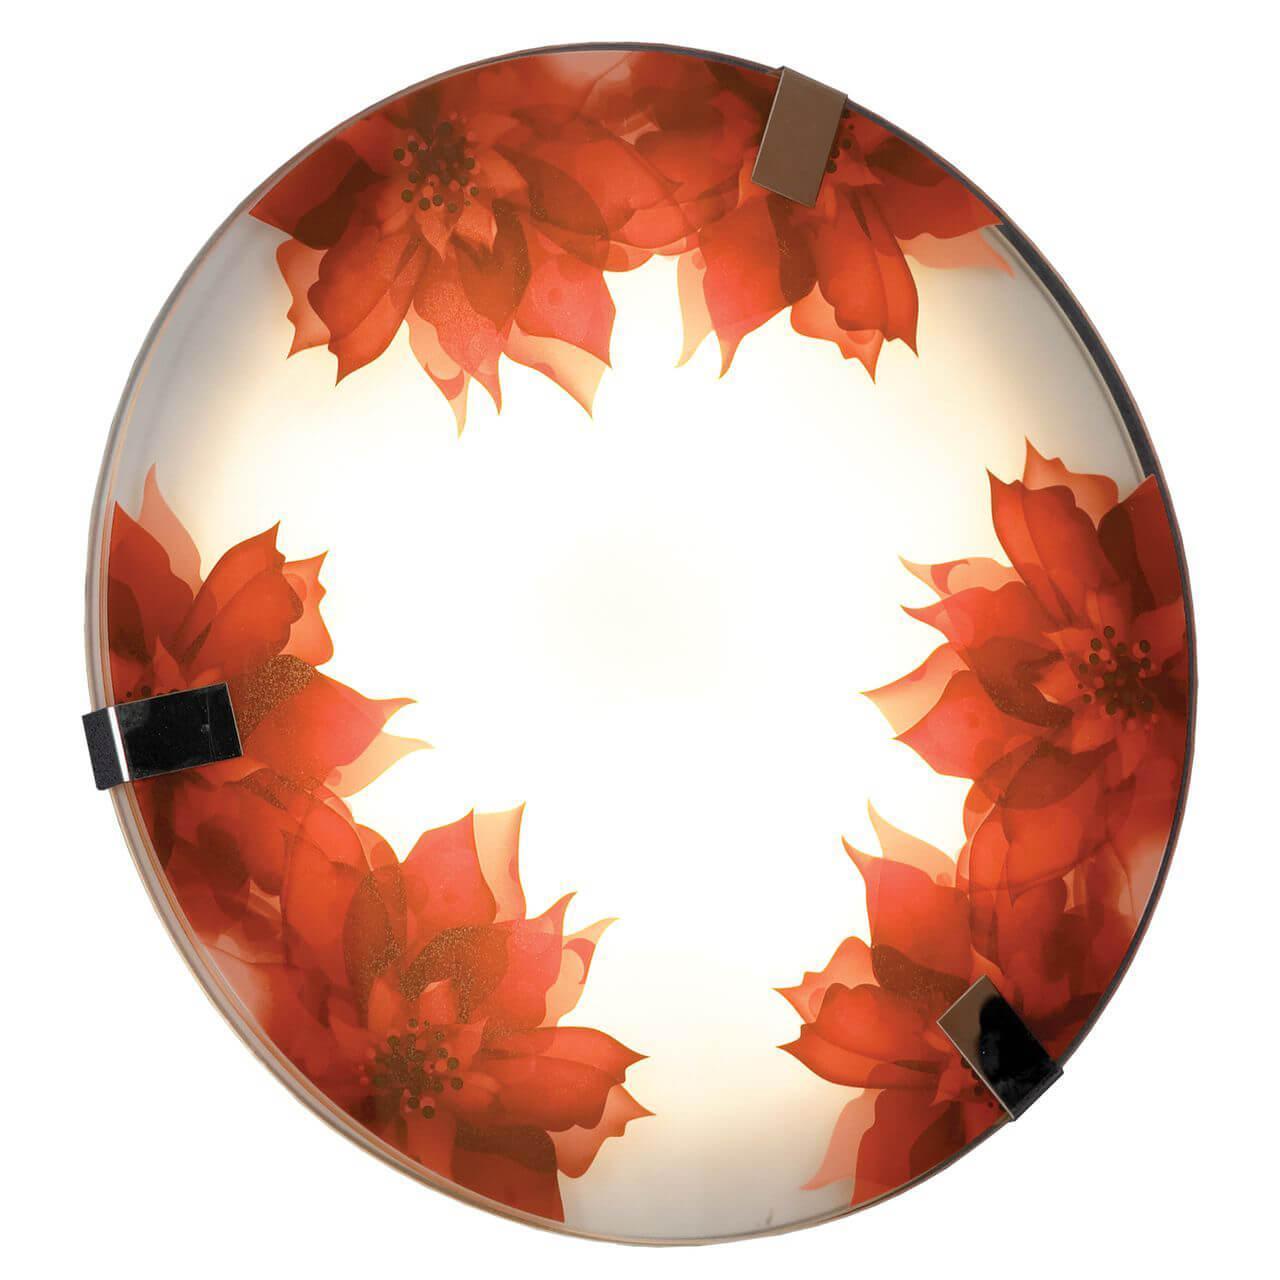 Настенный светильник Lussole LSN-5252-01, LED, 16 Вт цена